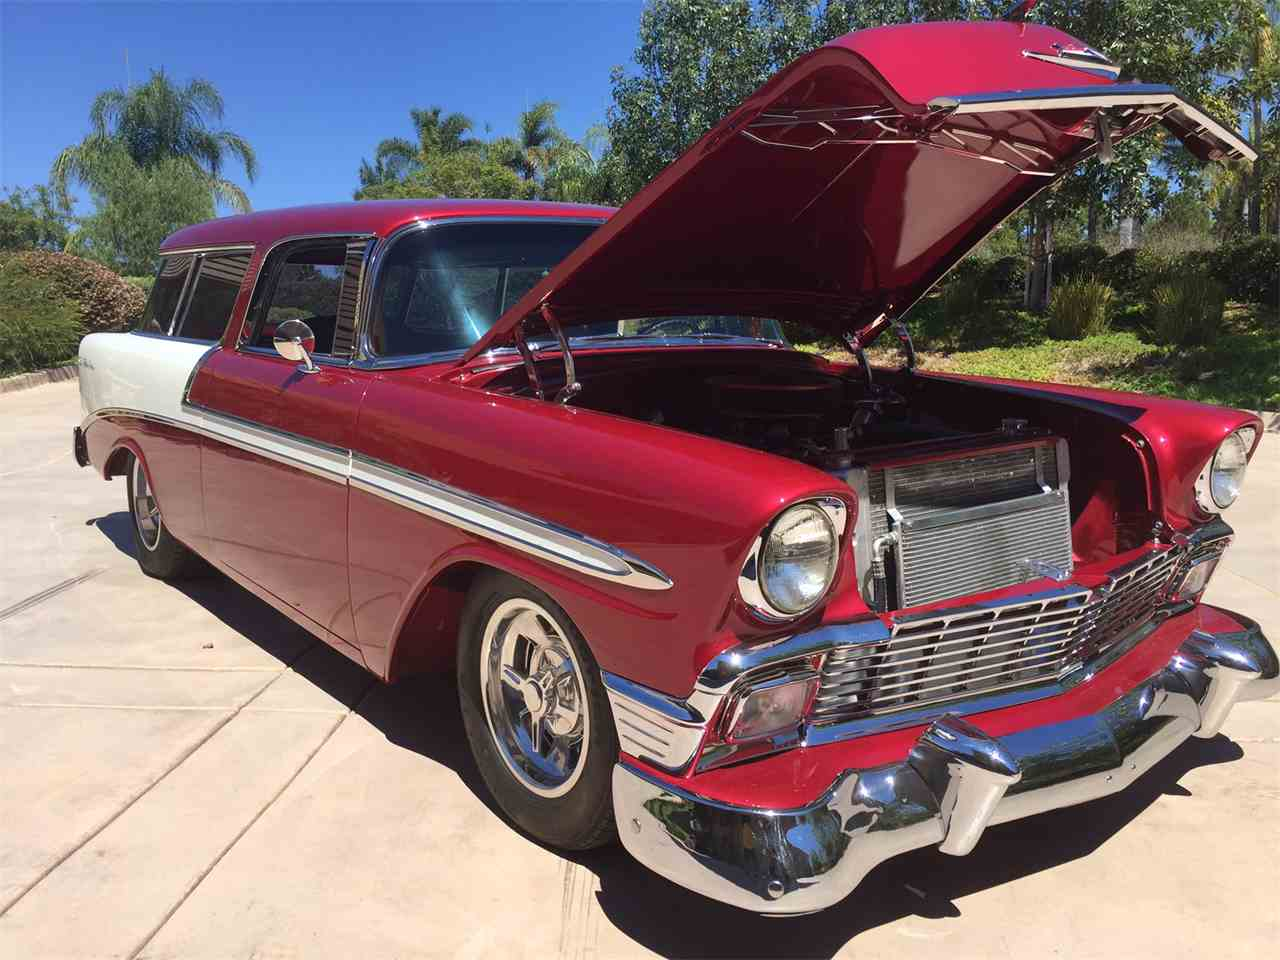 1956 Chevrolet Nomad for Sale | ClassicCars.com | CC-906020